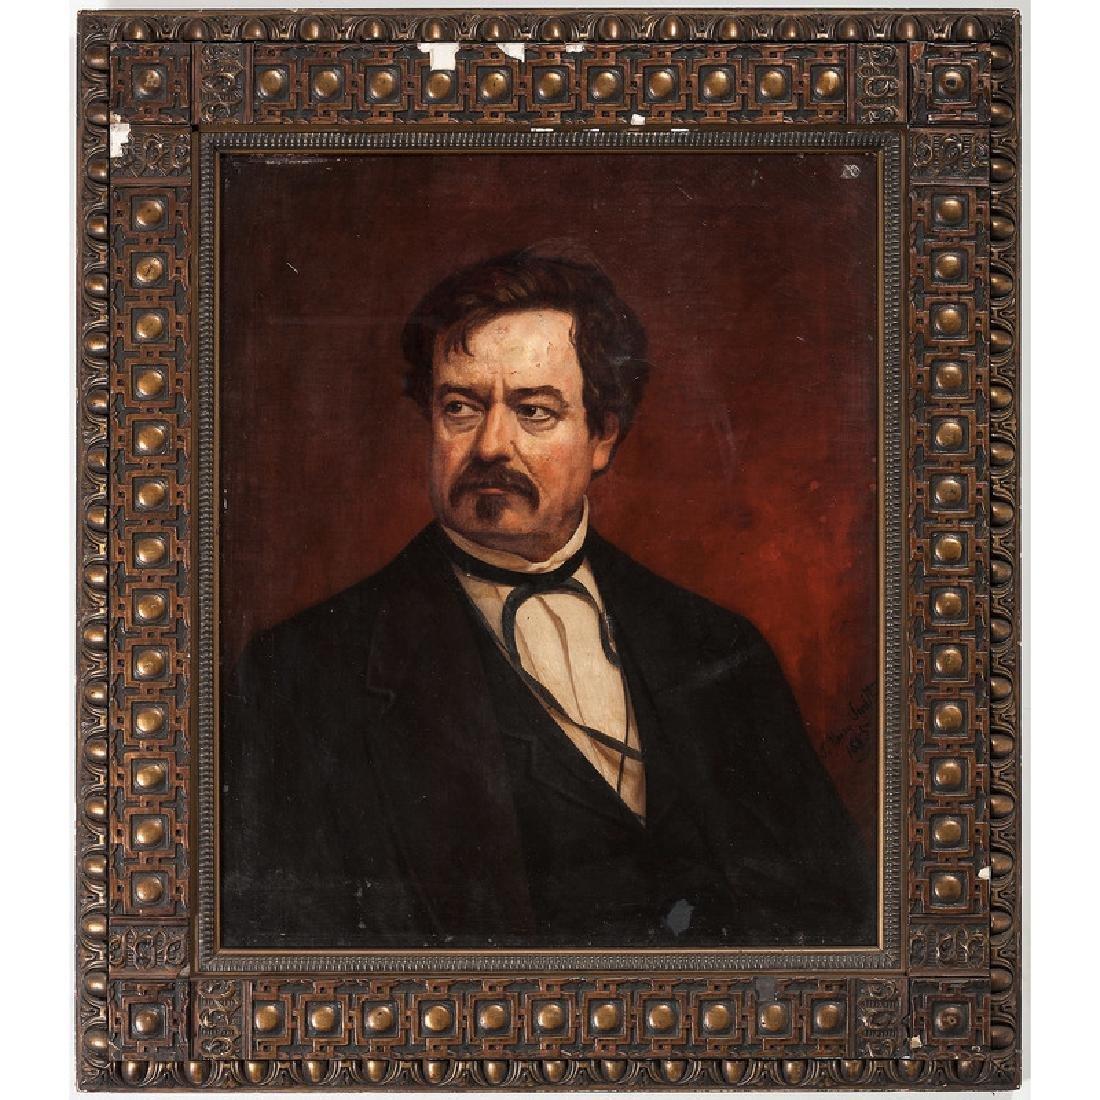 J. Henry Smith (American, 19th century)